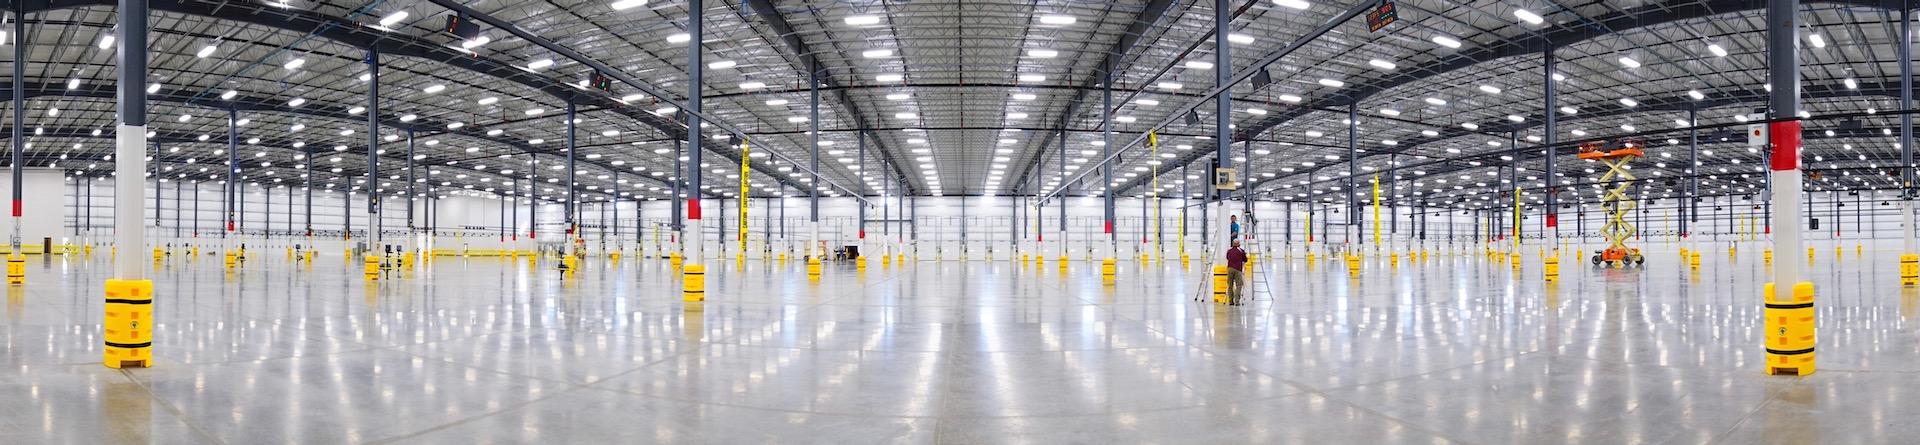 Robert K. Mericle Industrial Building Interior Wide Angle